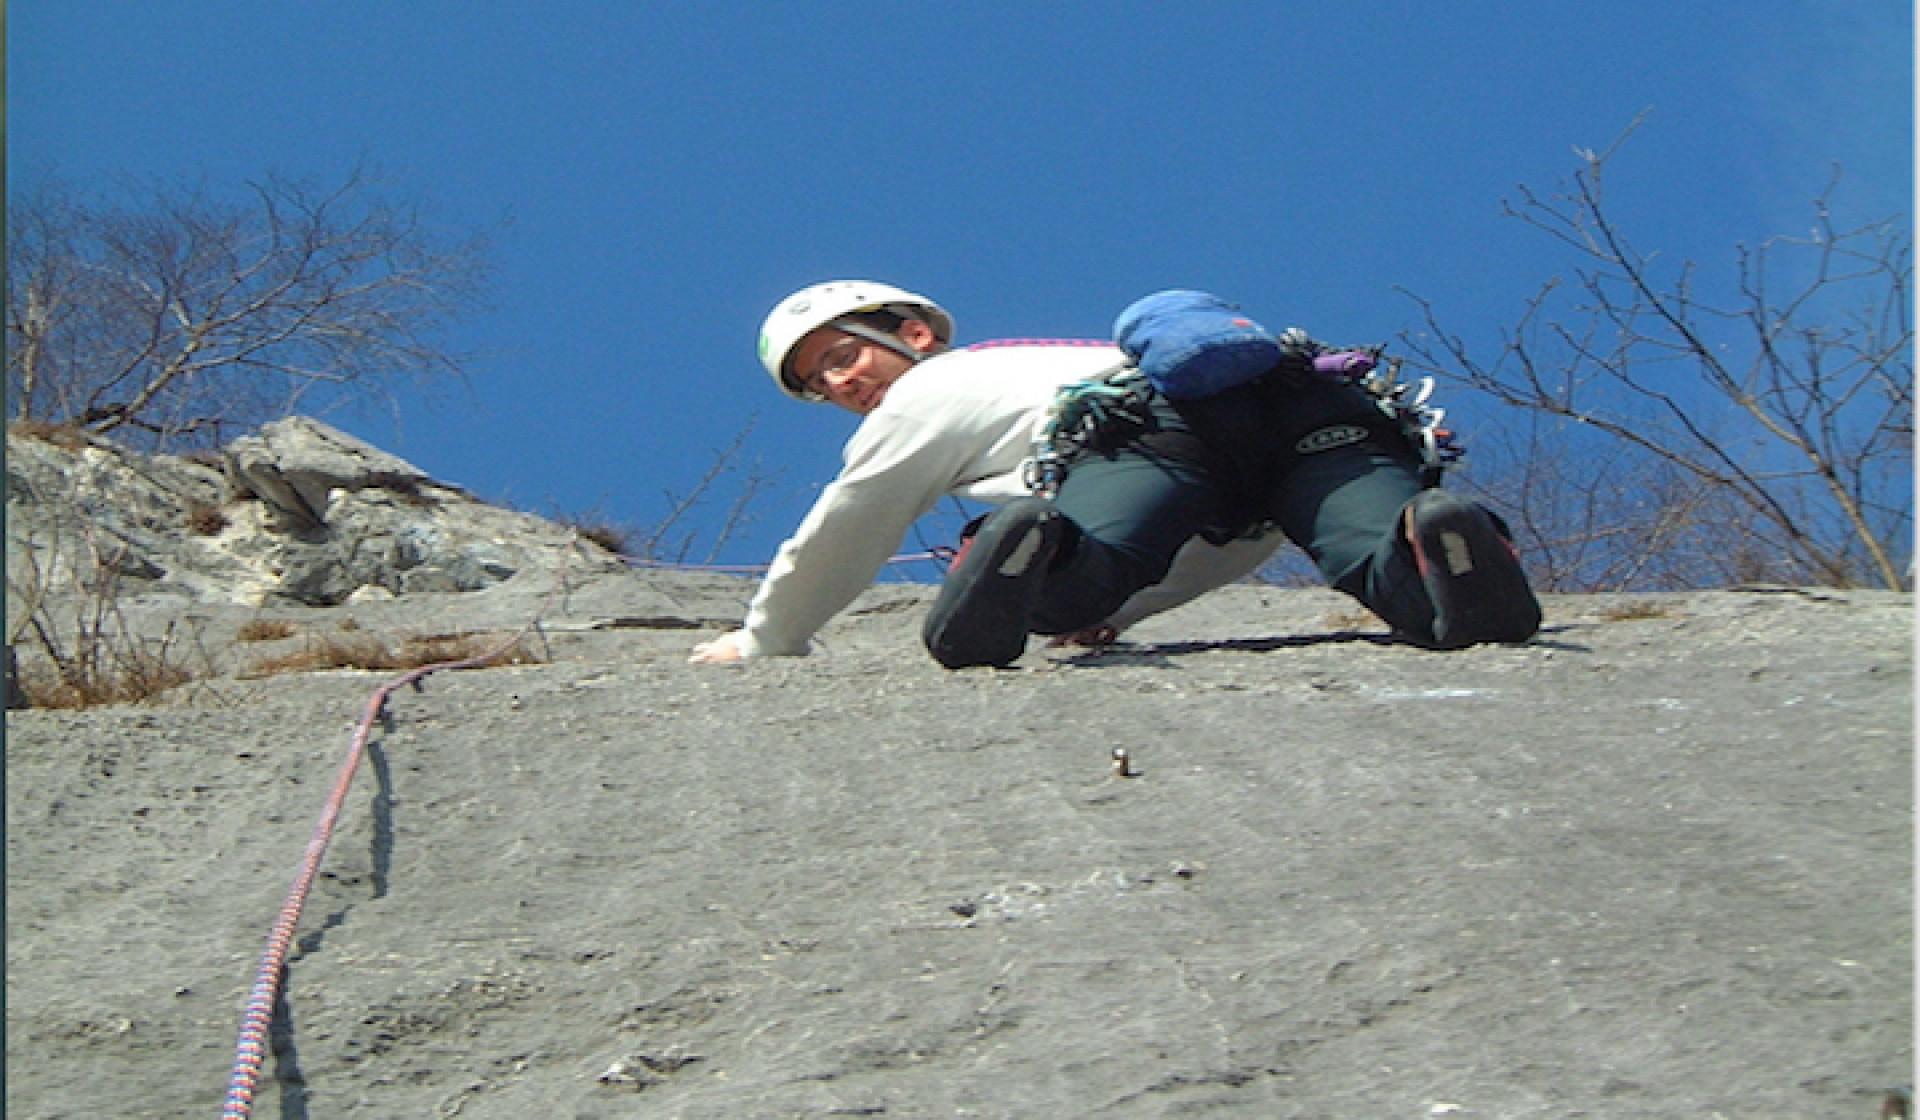 arrampicata 1920 x 1080